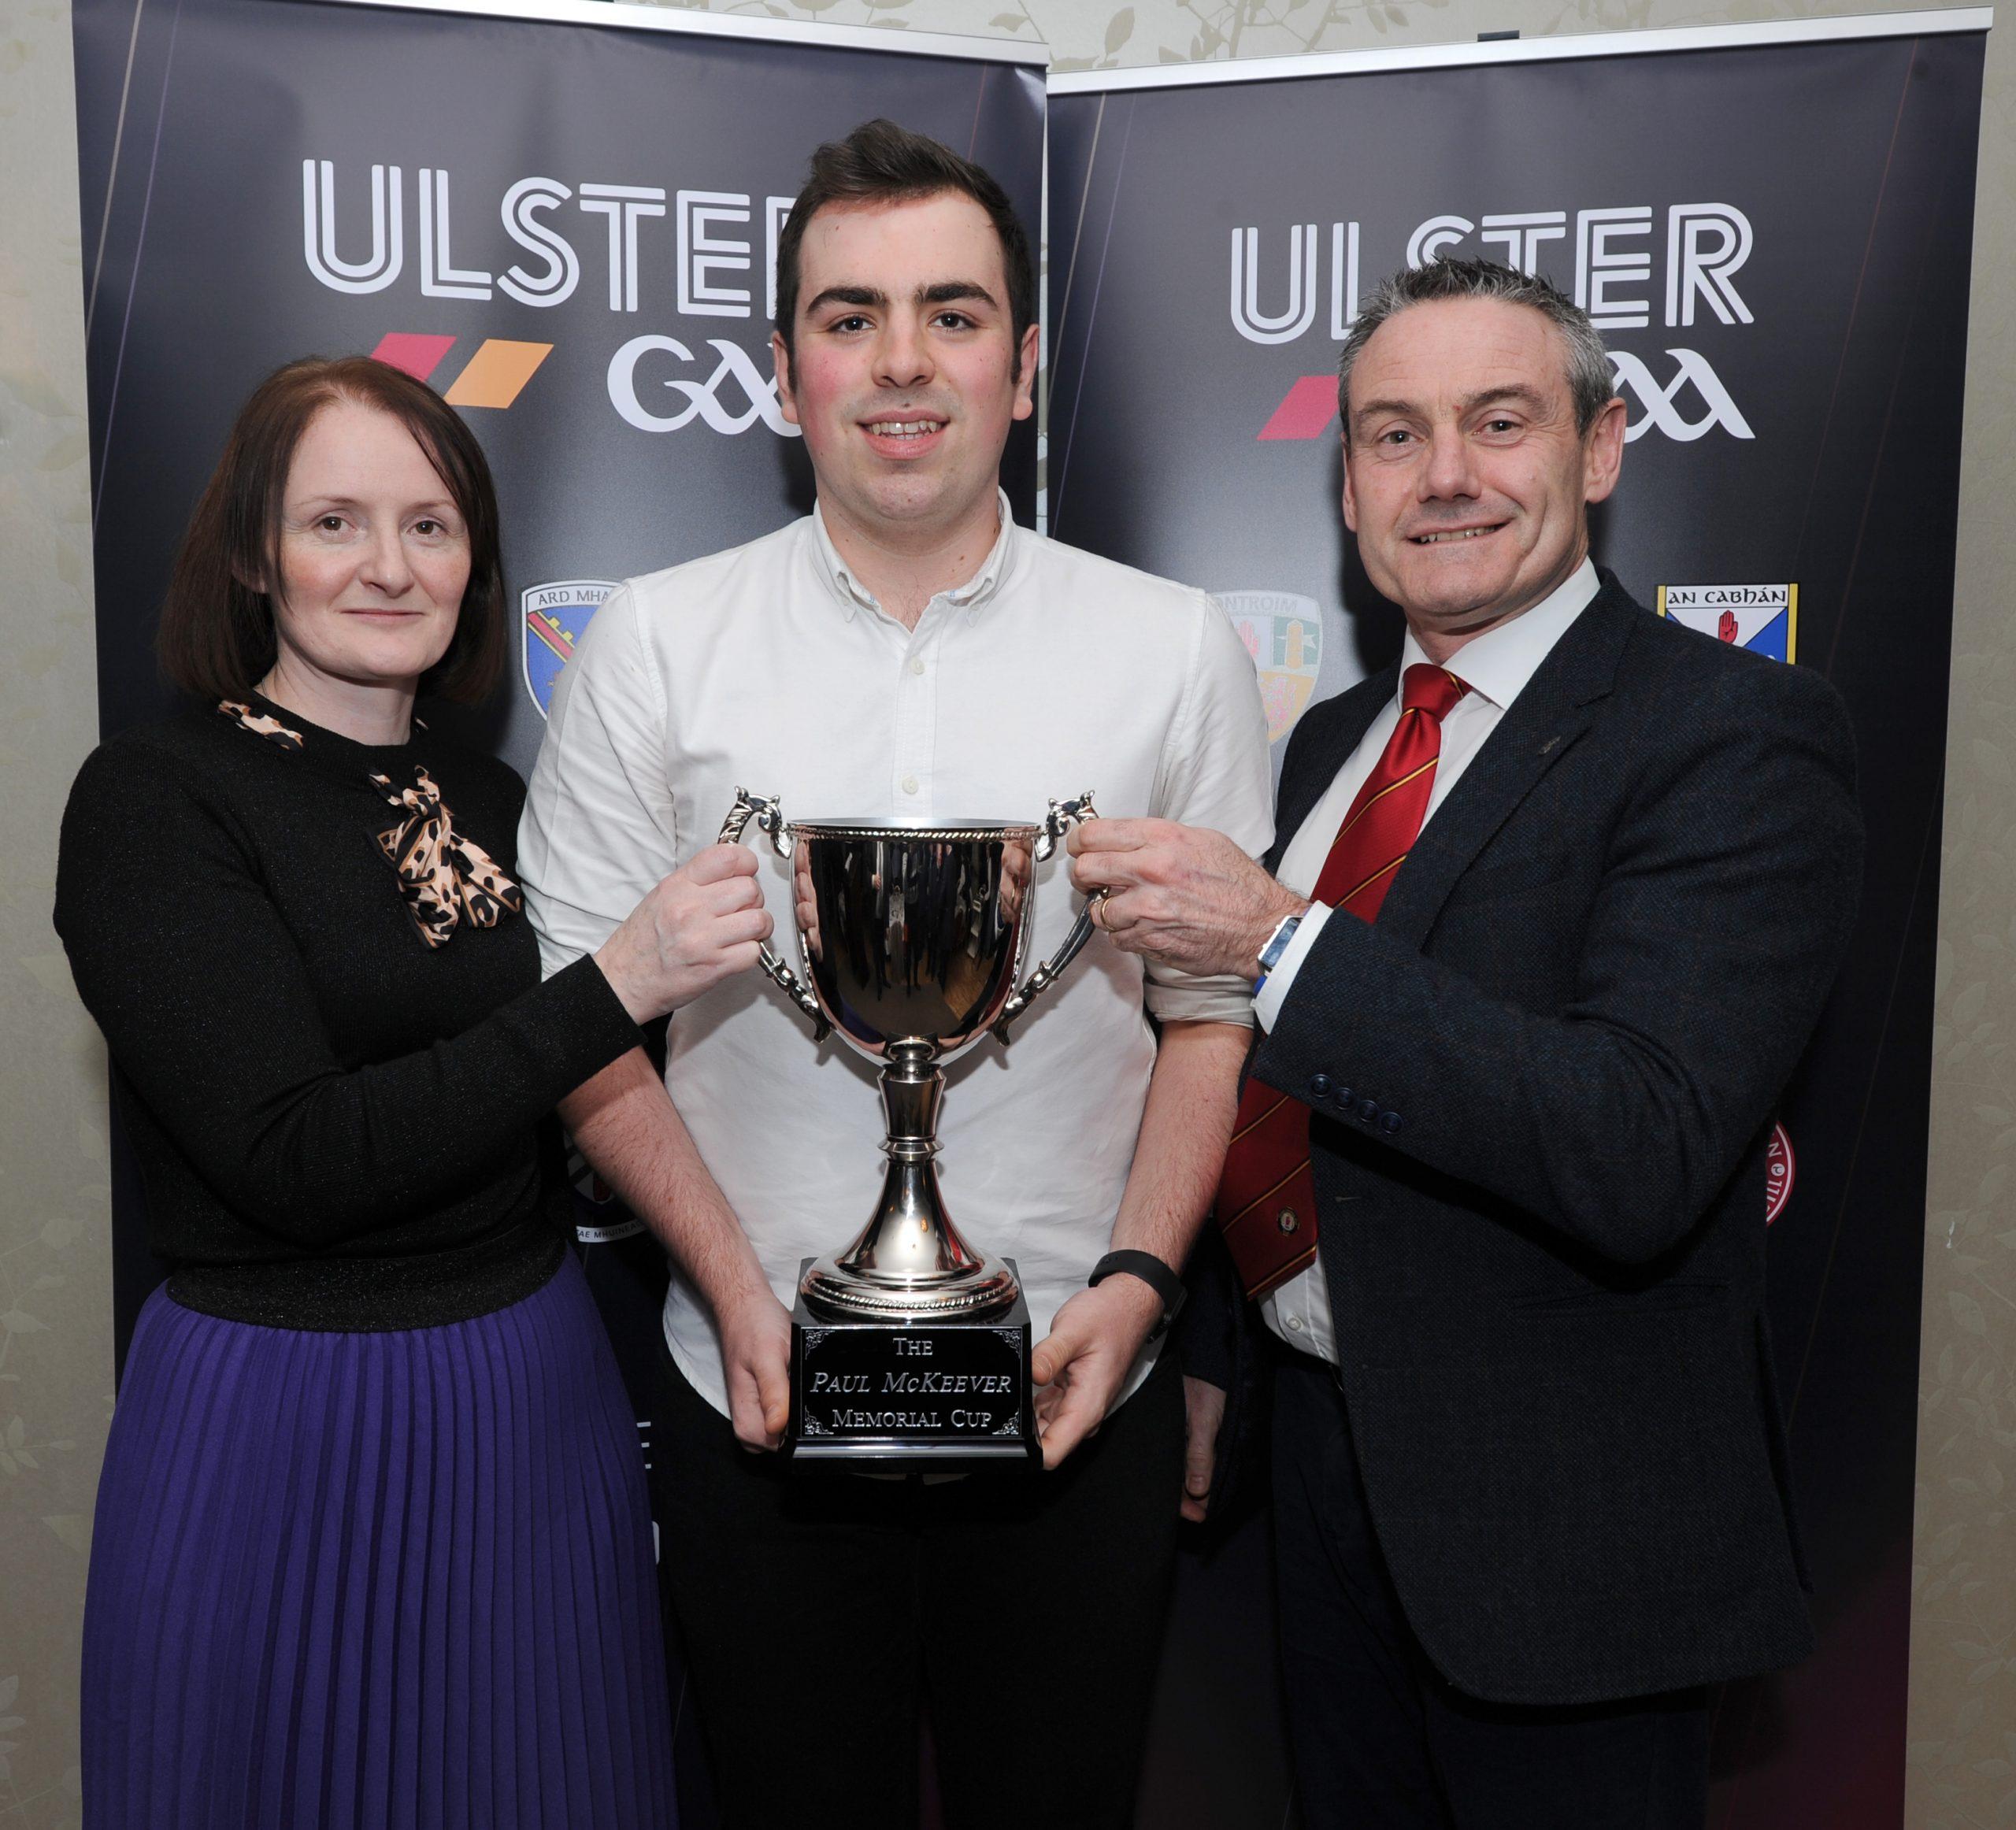 Ulster Referee Awards 2019